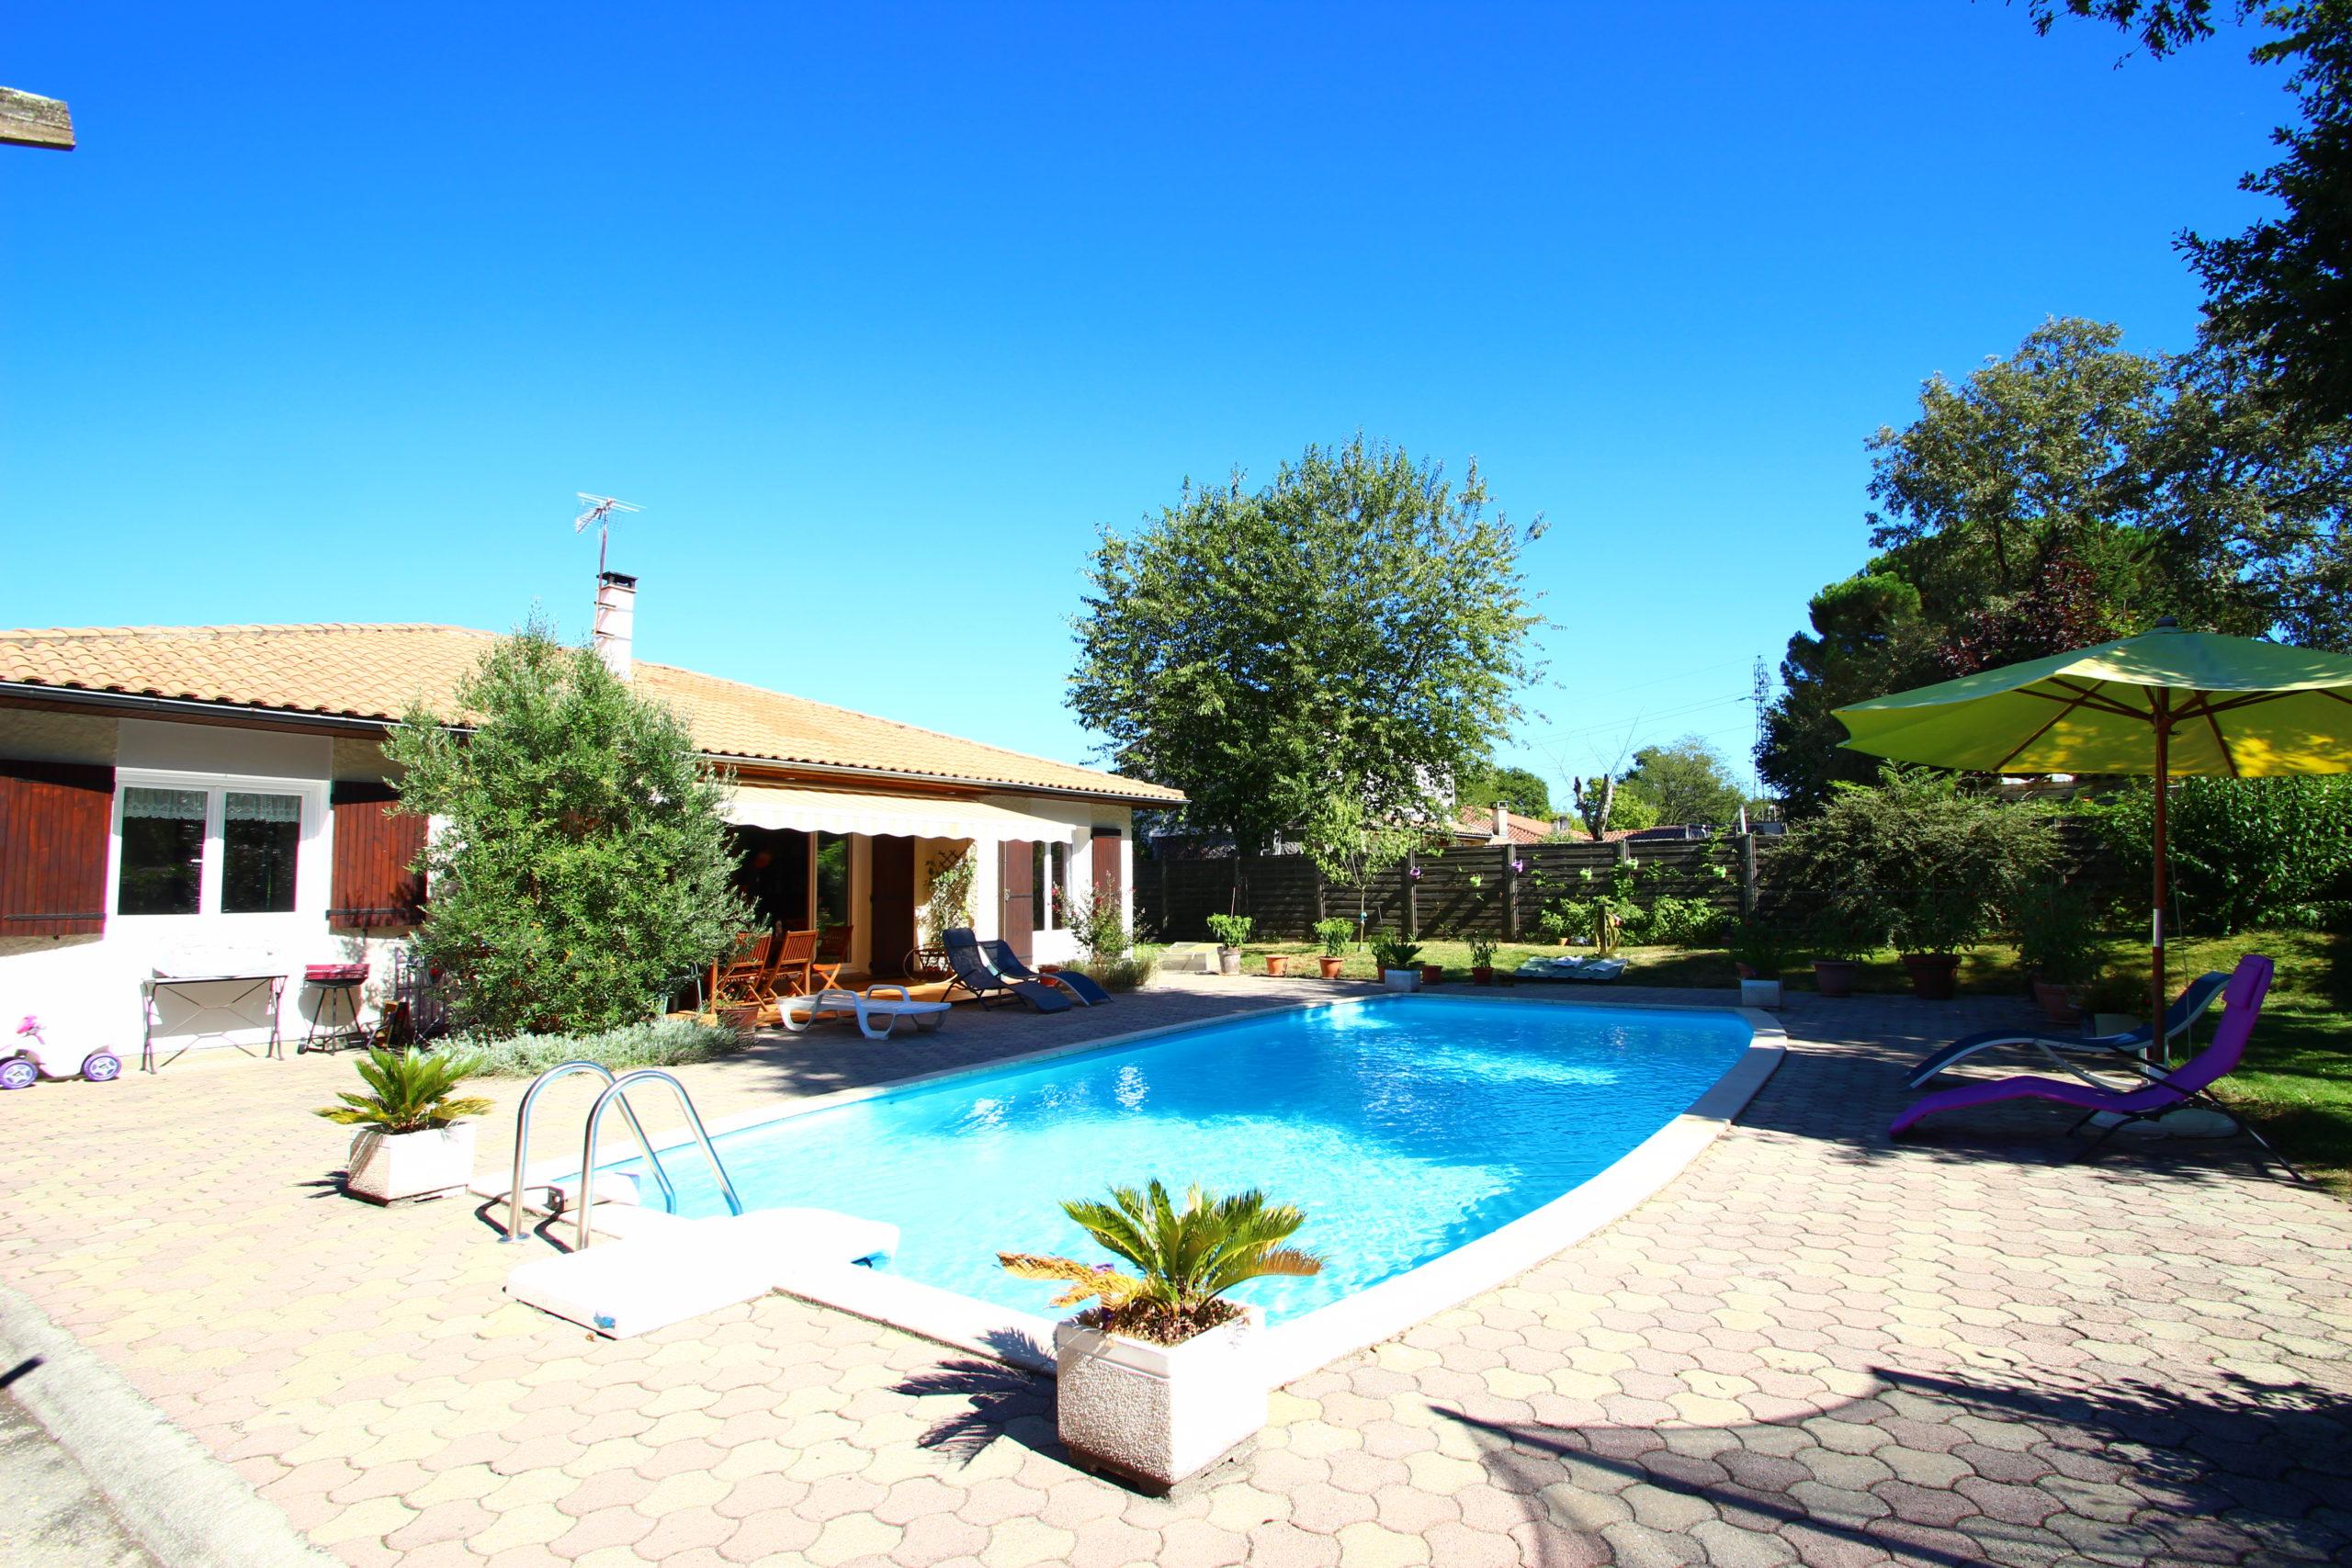 Maison avec Piscine & Jardin – Cestas Gazinet